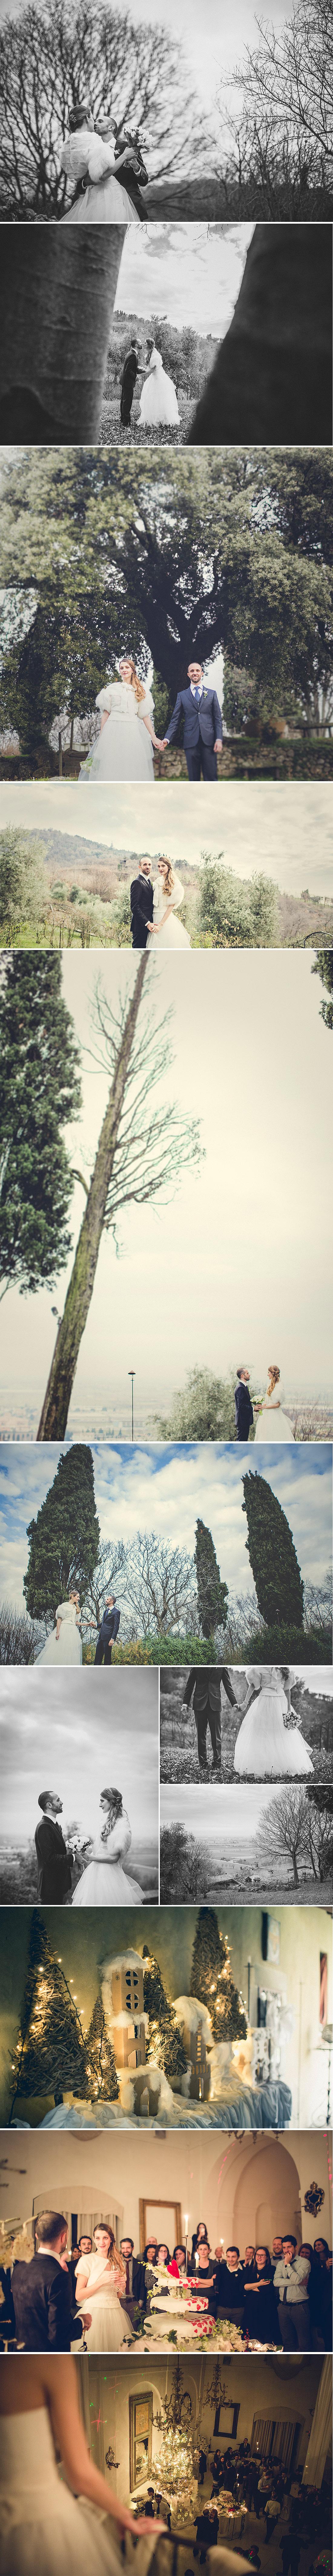 gusmeri_fotografo_matrimonio_sara_massimo2